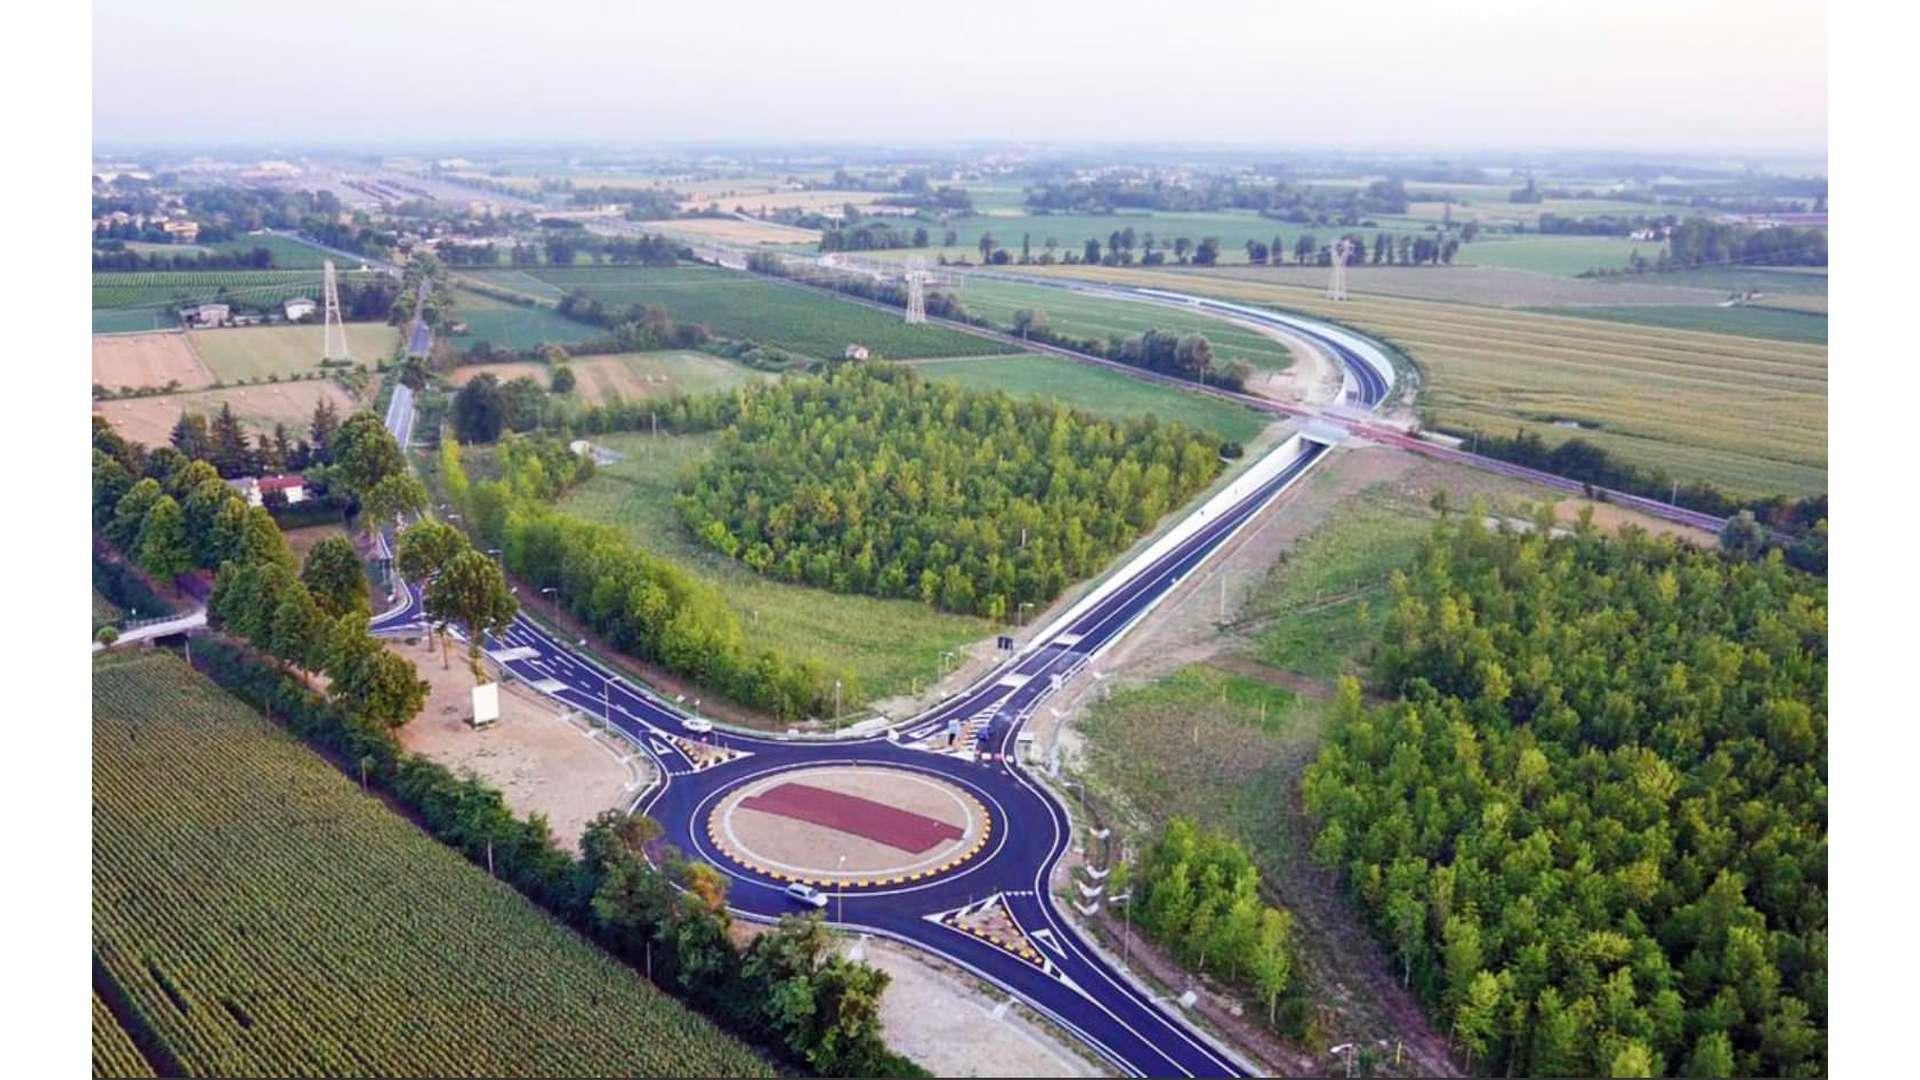 Svincolo Palmanova 002 EFarm Studio ingegneria Padova